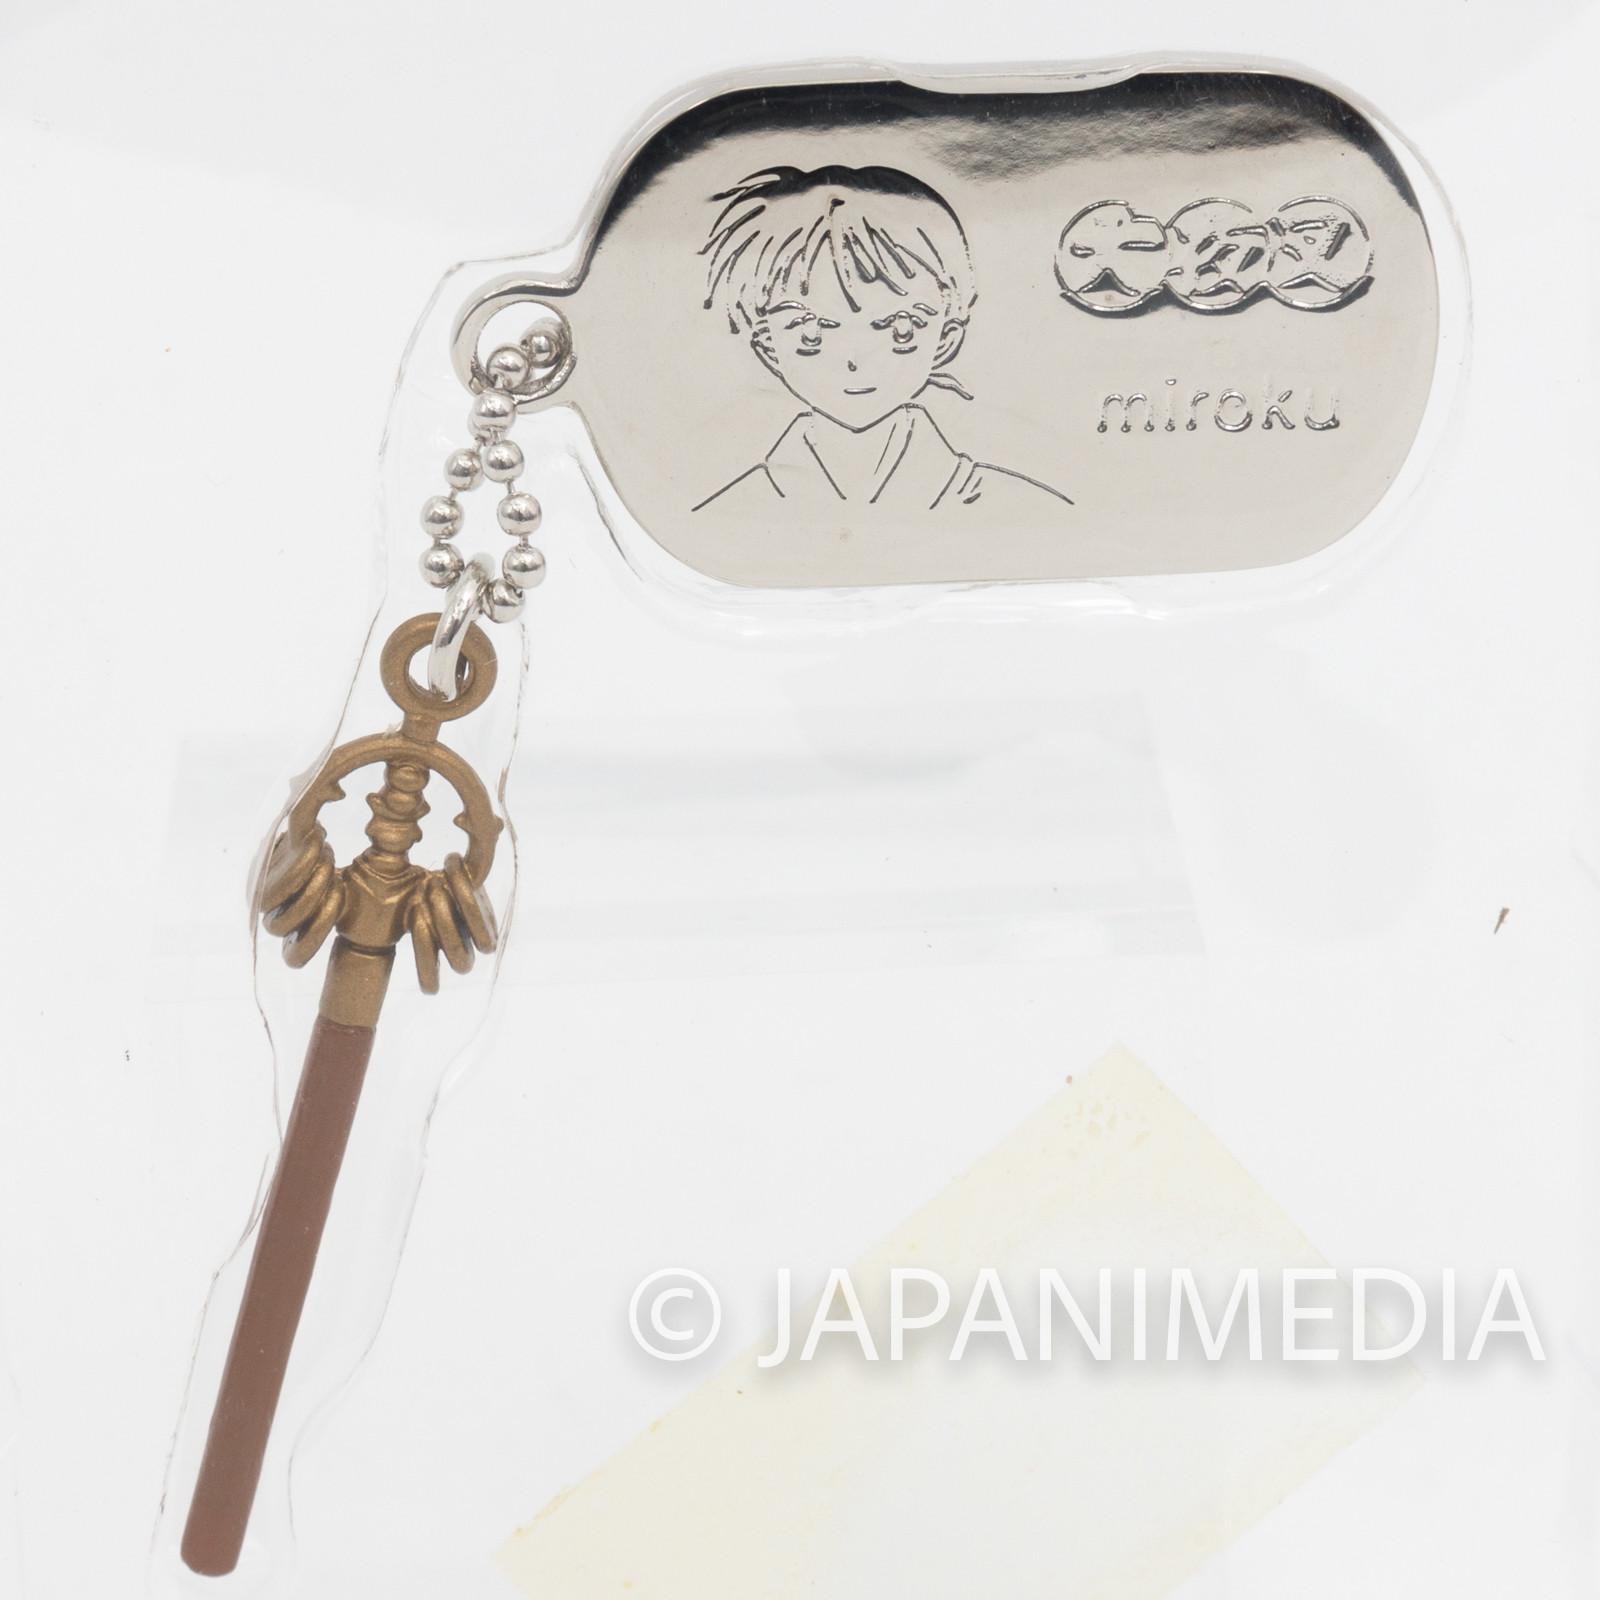 Inuyasha Miroku Metal Plate Mascot Banpresto JAPAN ANIME MANGA